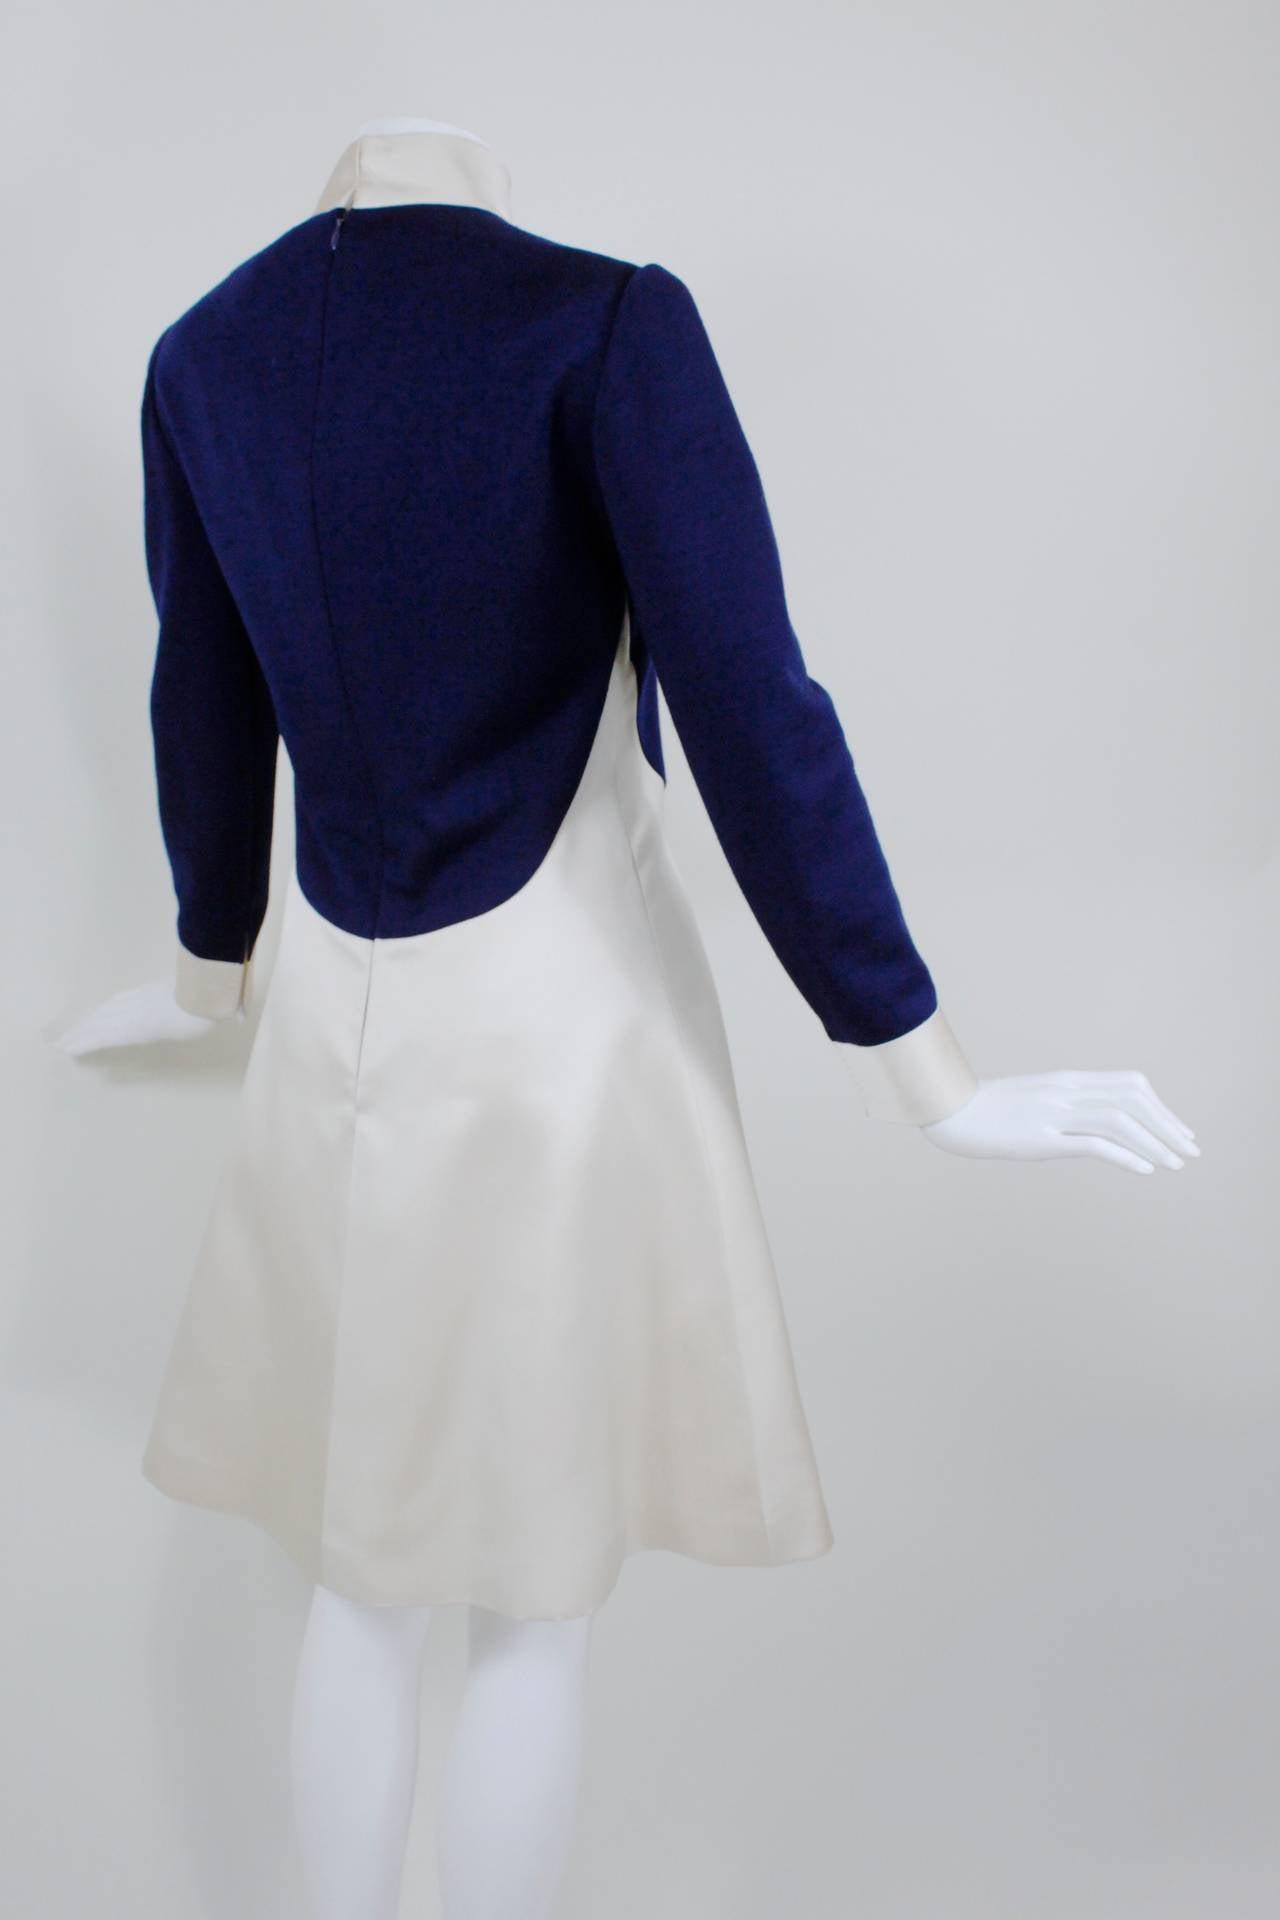 1960s Geoffrey Beene Navy Wool and Eggshell Mod Dress 6